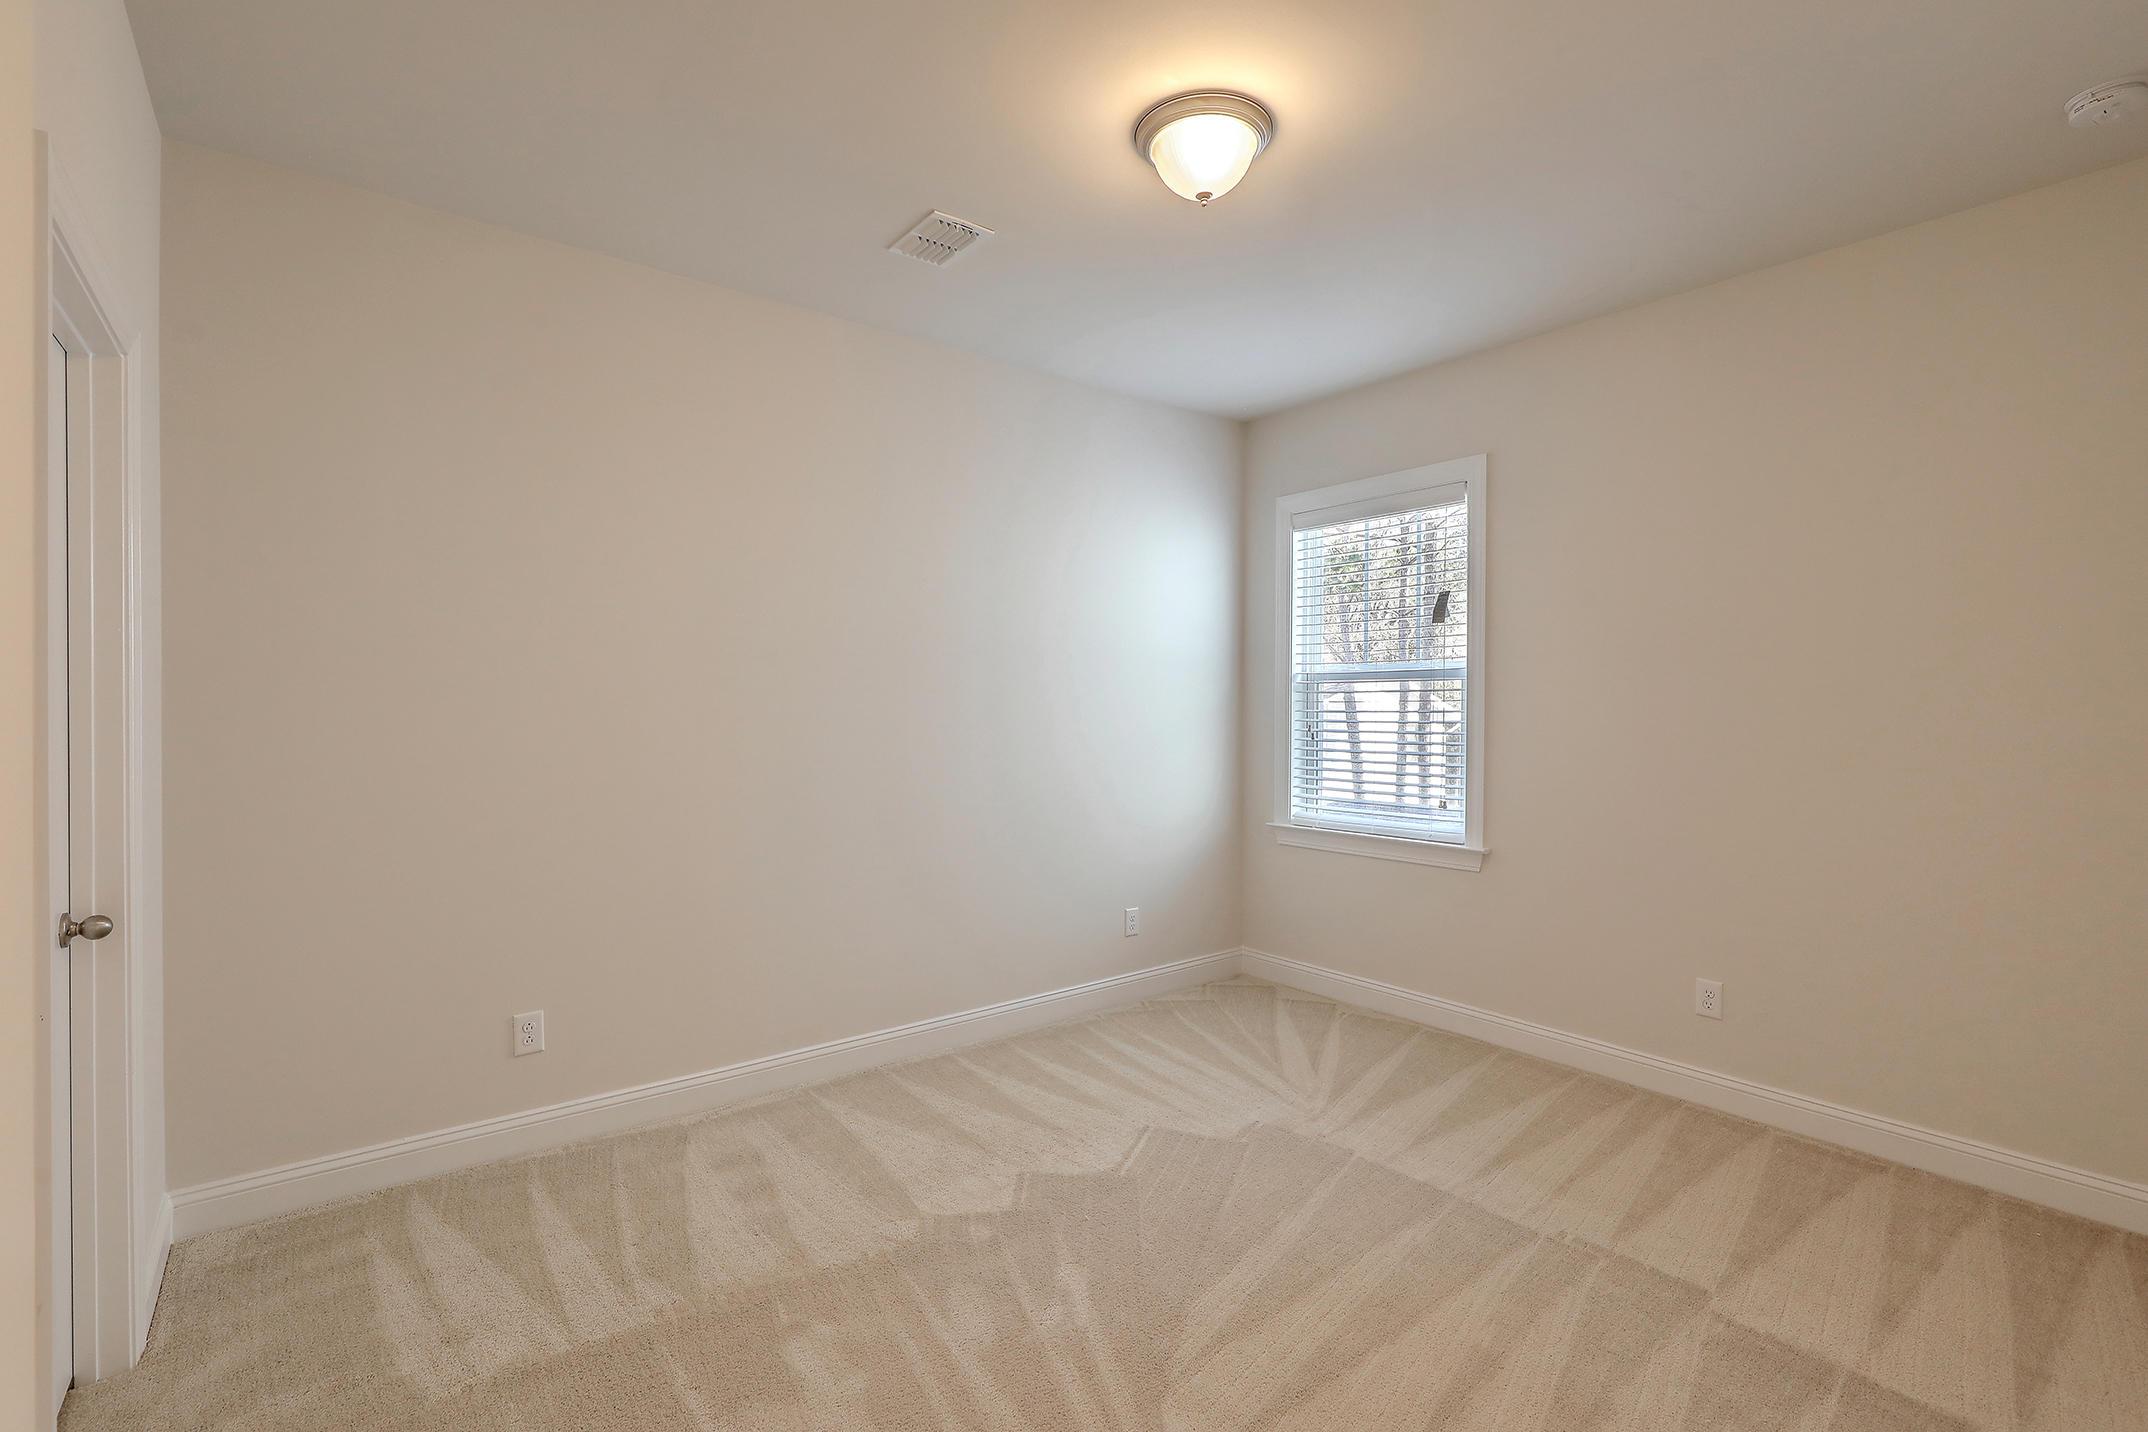 Bentley Park Homes For Sale - 1281 Gannett, Mount Pleasant, SC - 37